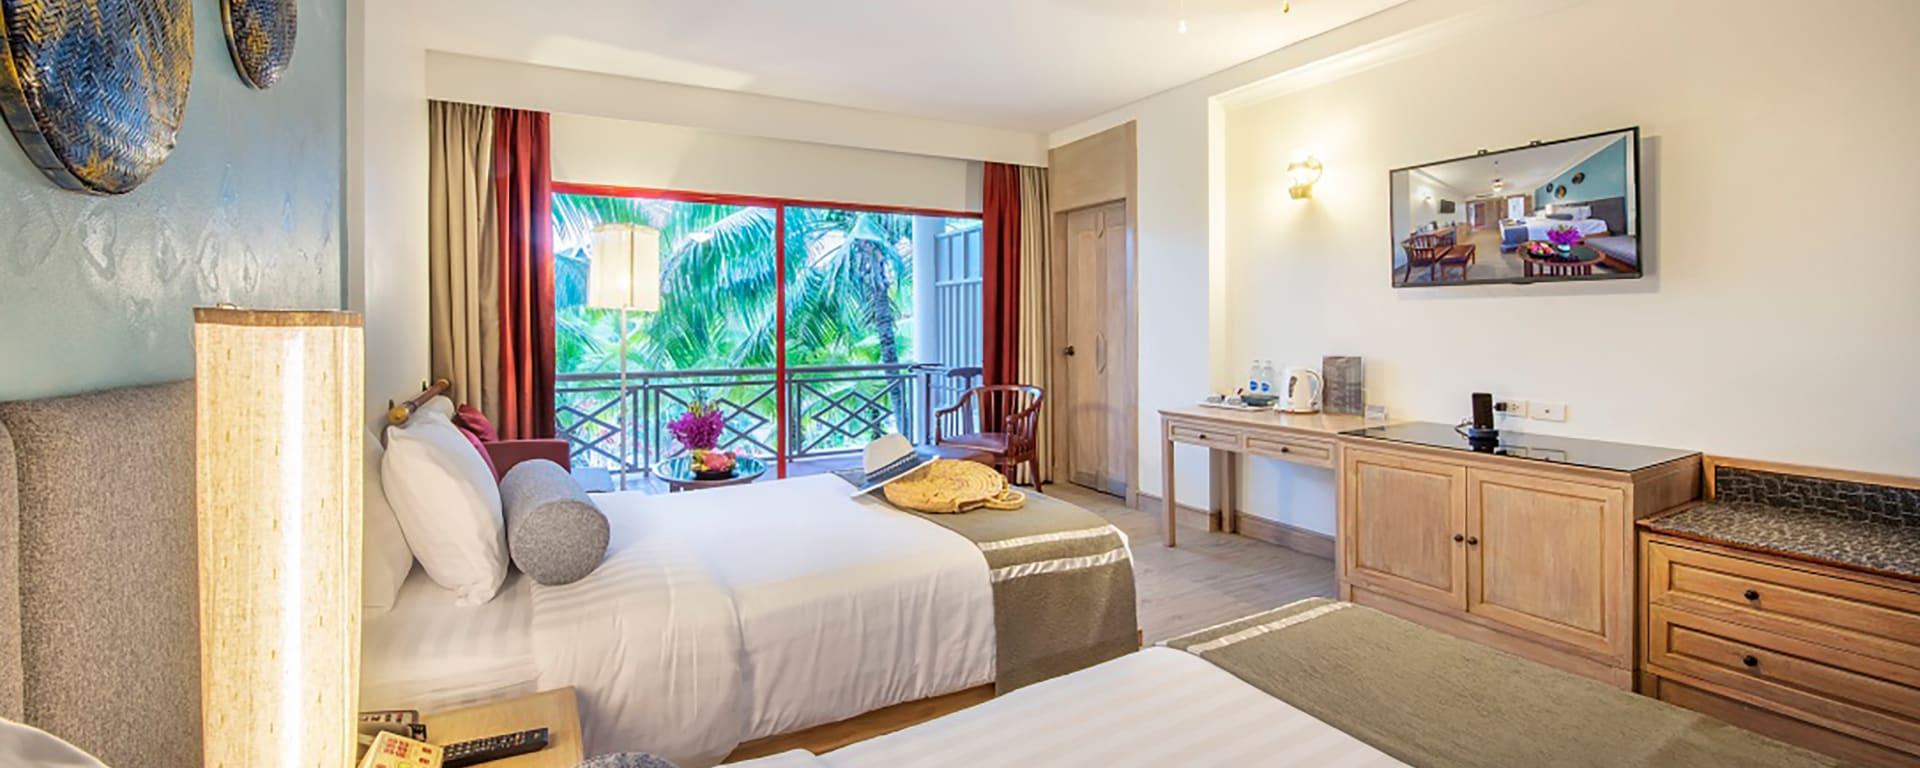 Cha Da Thai Village Resort in Krabi: Krabi Cha Da Thai Village Resort Deluxe Zimmer